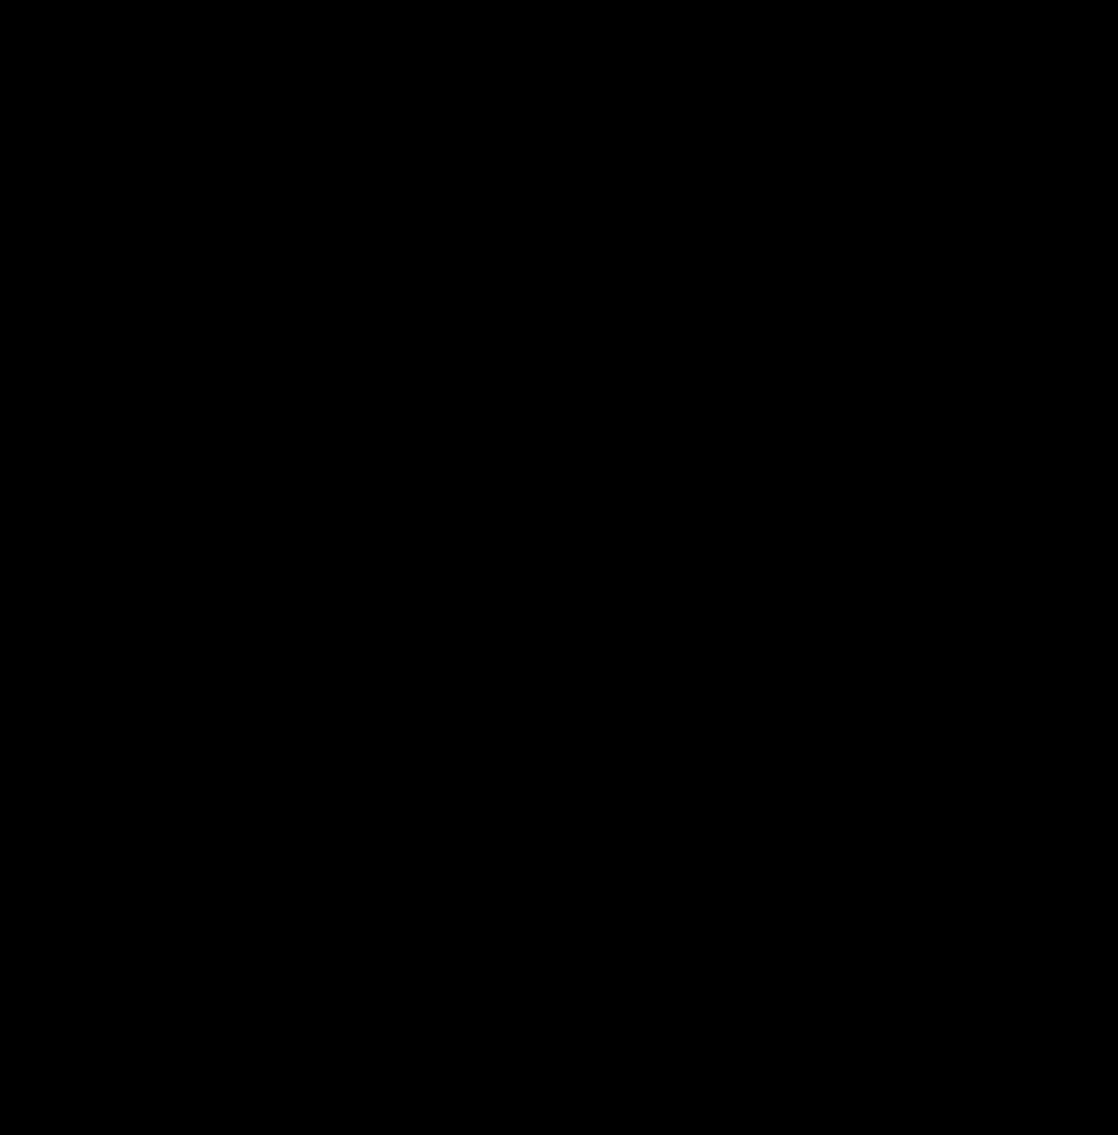 1118x1135 Planets Clip Art